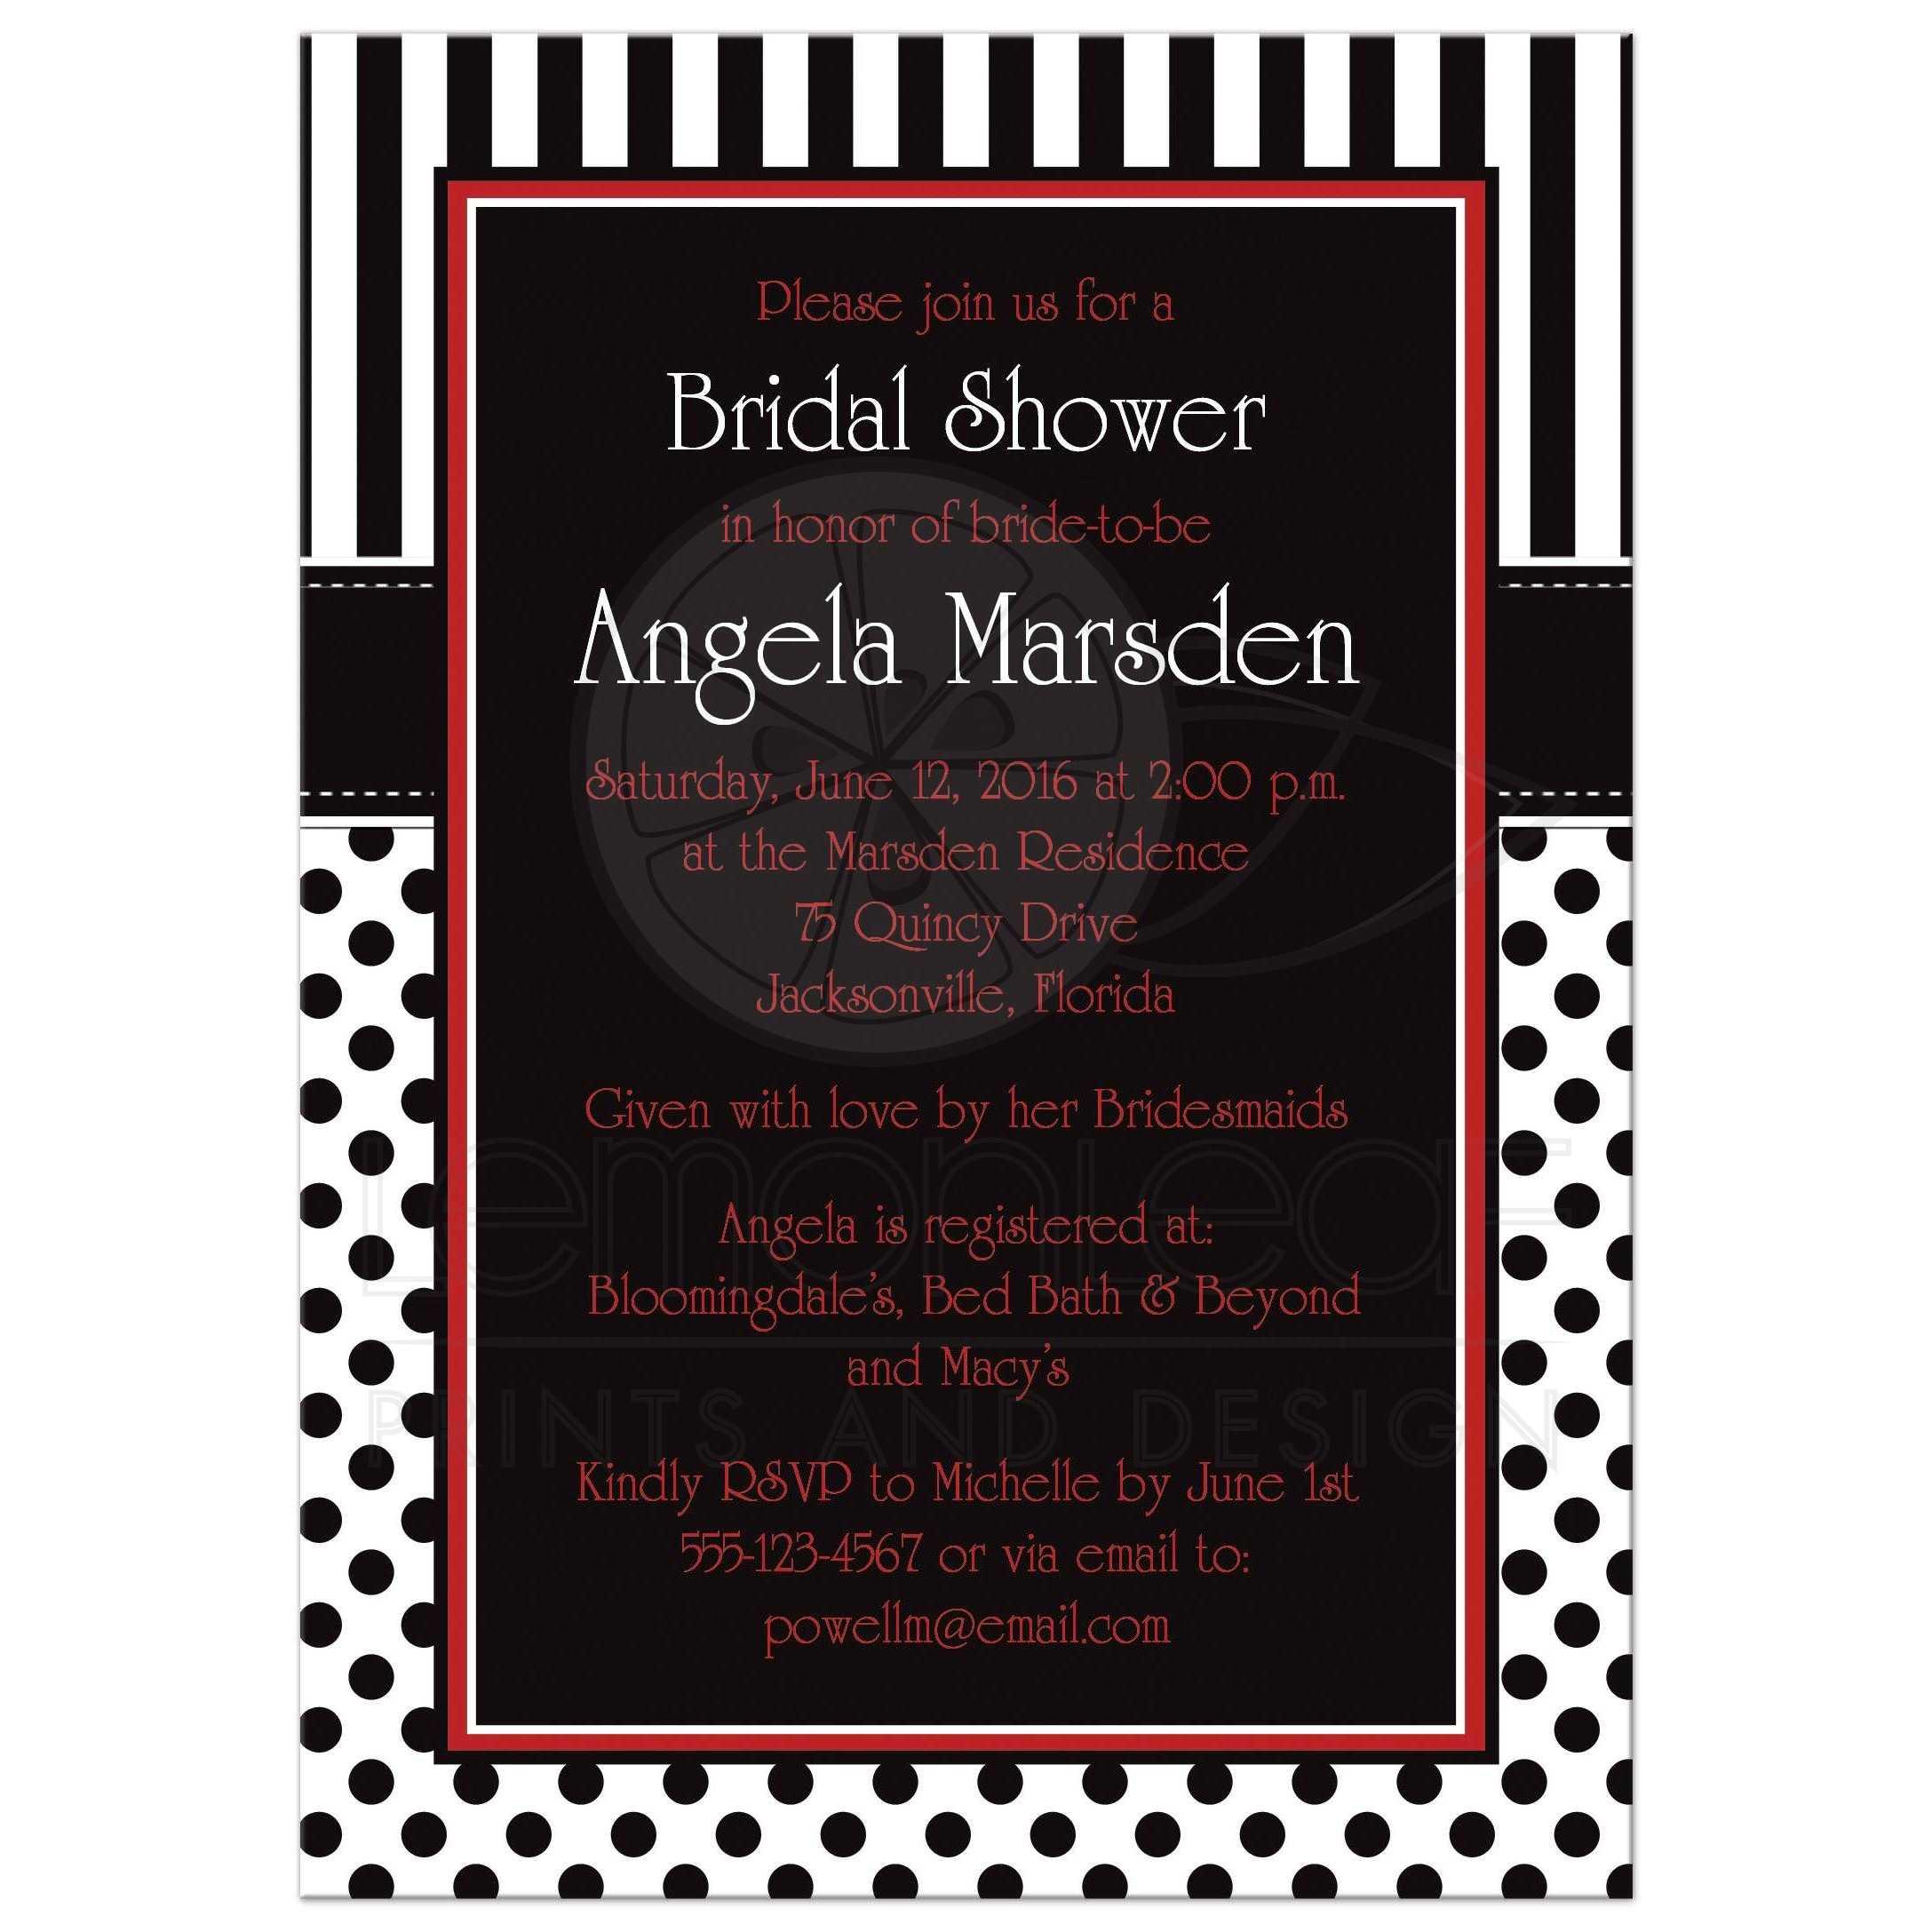 Wedding Invitations Red White And Black: Bridal Shower Invitation